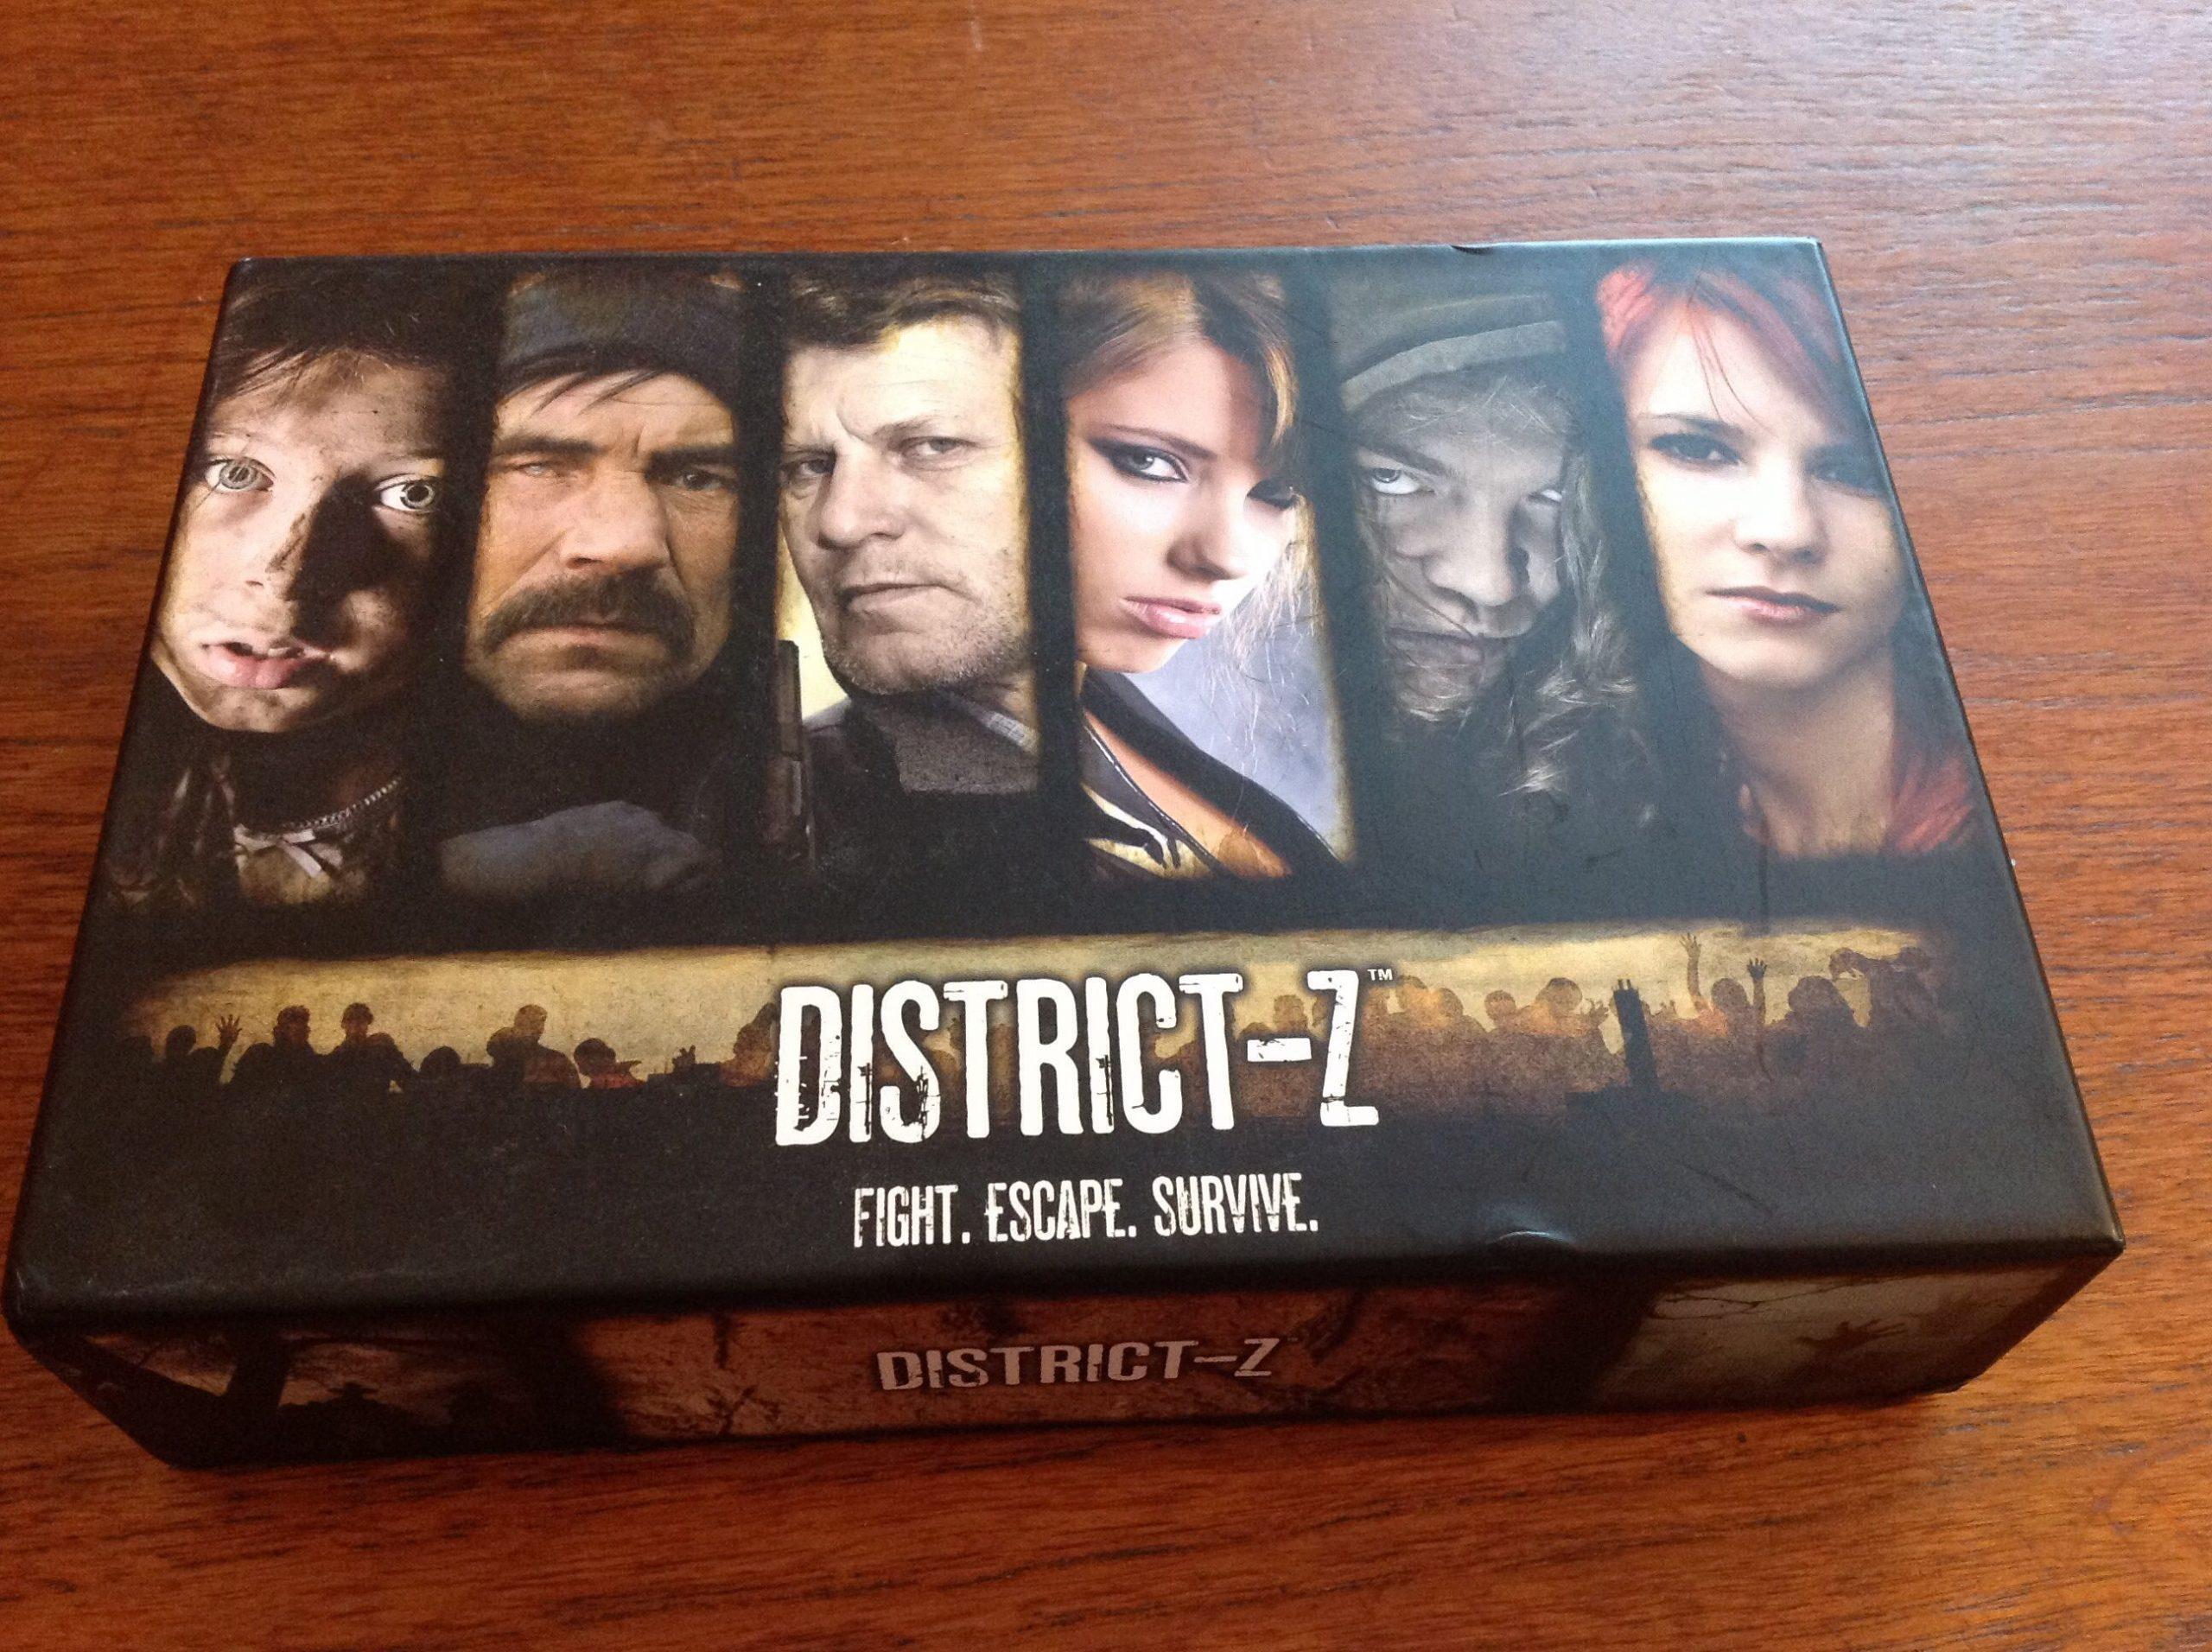 настольная игра District-Z Район-Z